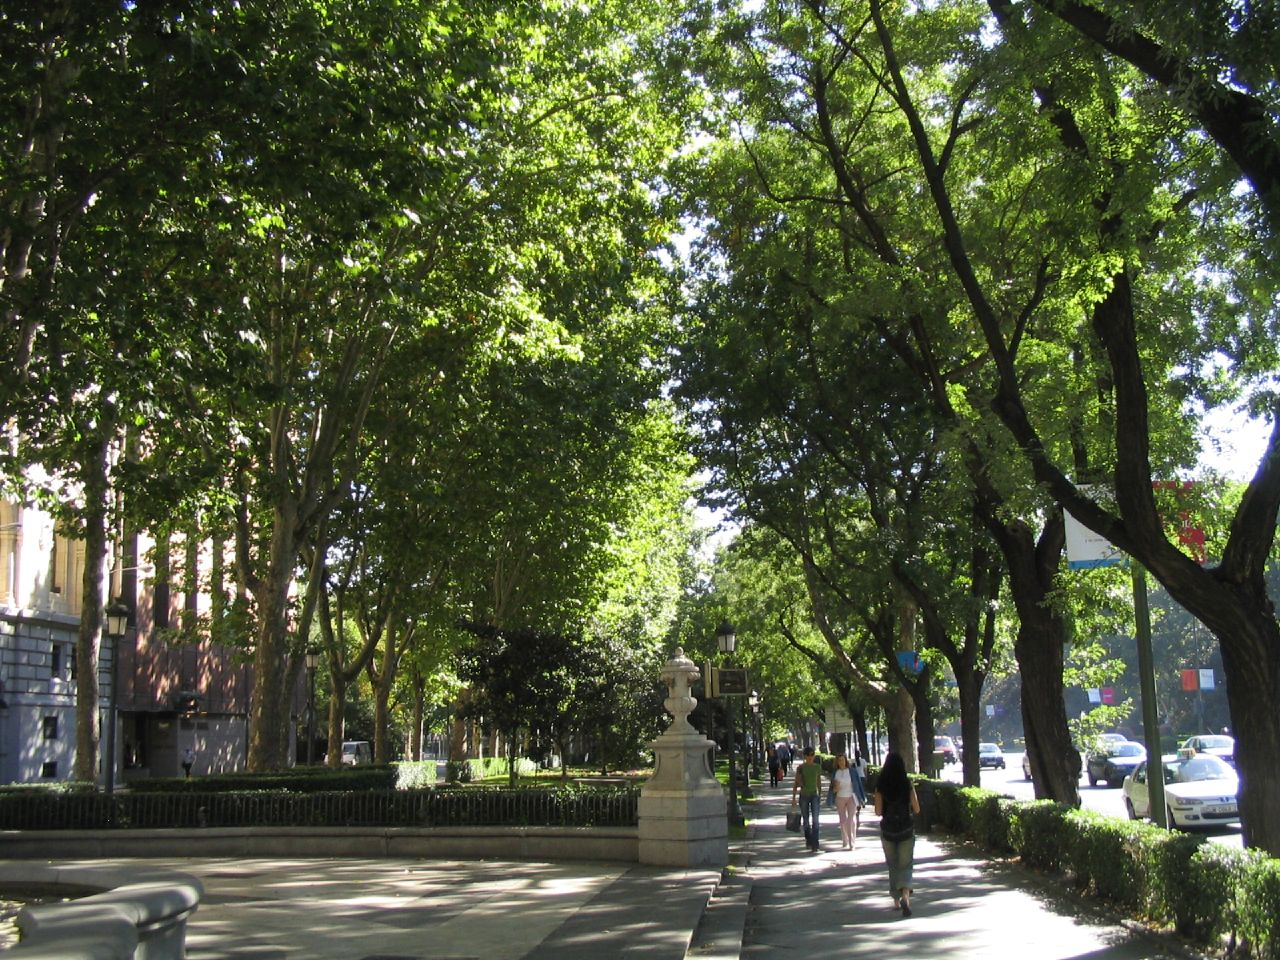 Paseo del prado wikipedia la enciclopedia libre for Jardin urbano gijon